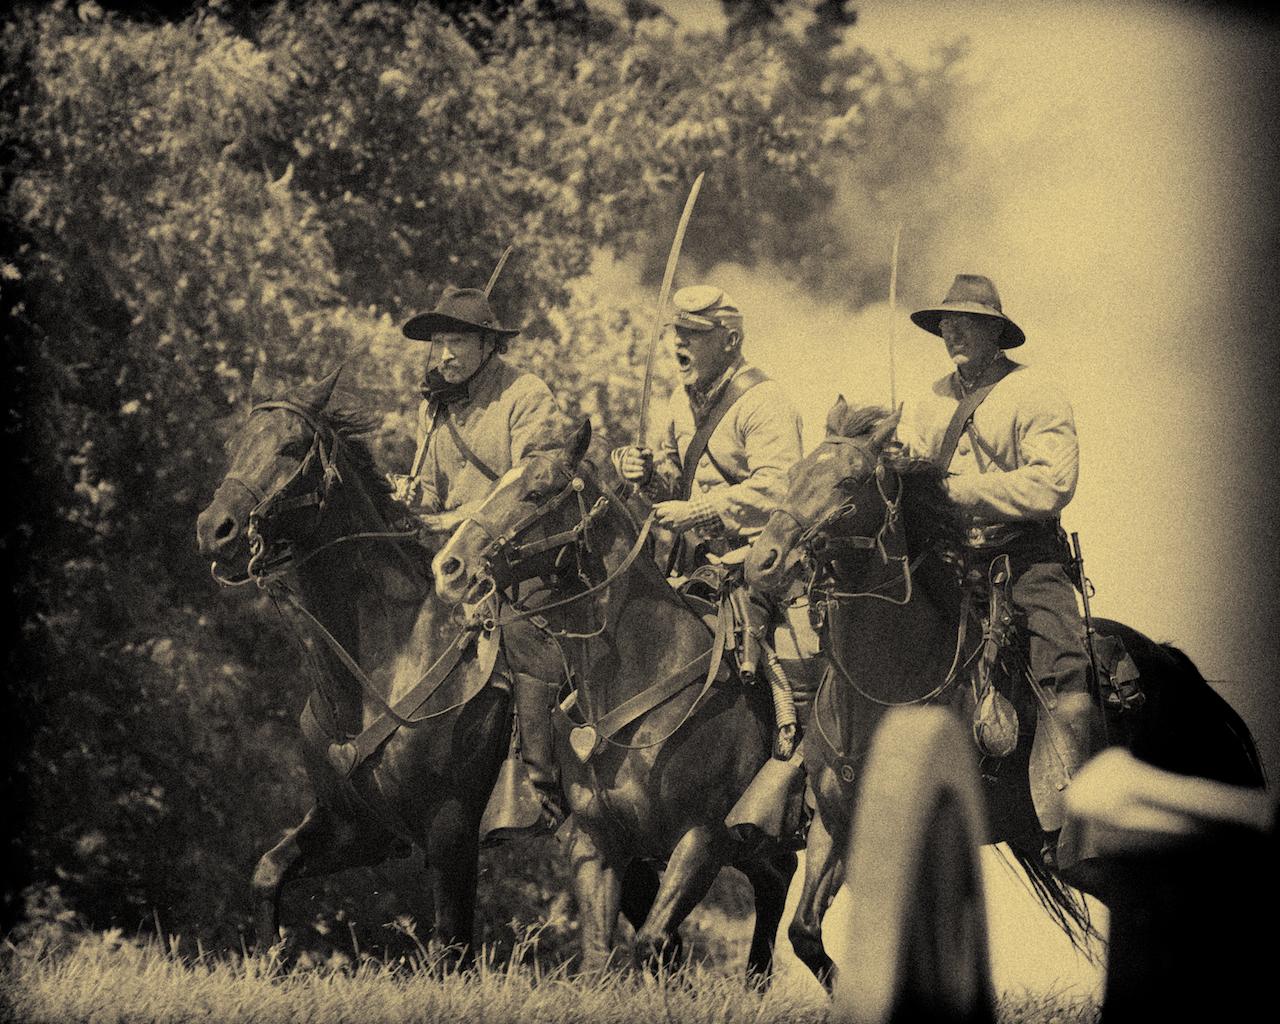 IDMkIV_Civil War Battle_2010-07-10_5260_Original.jpg